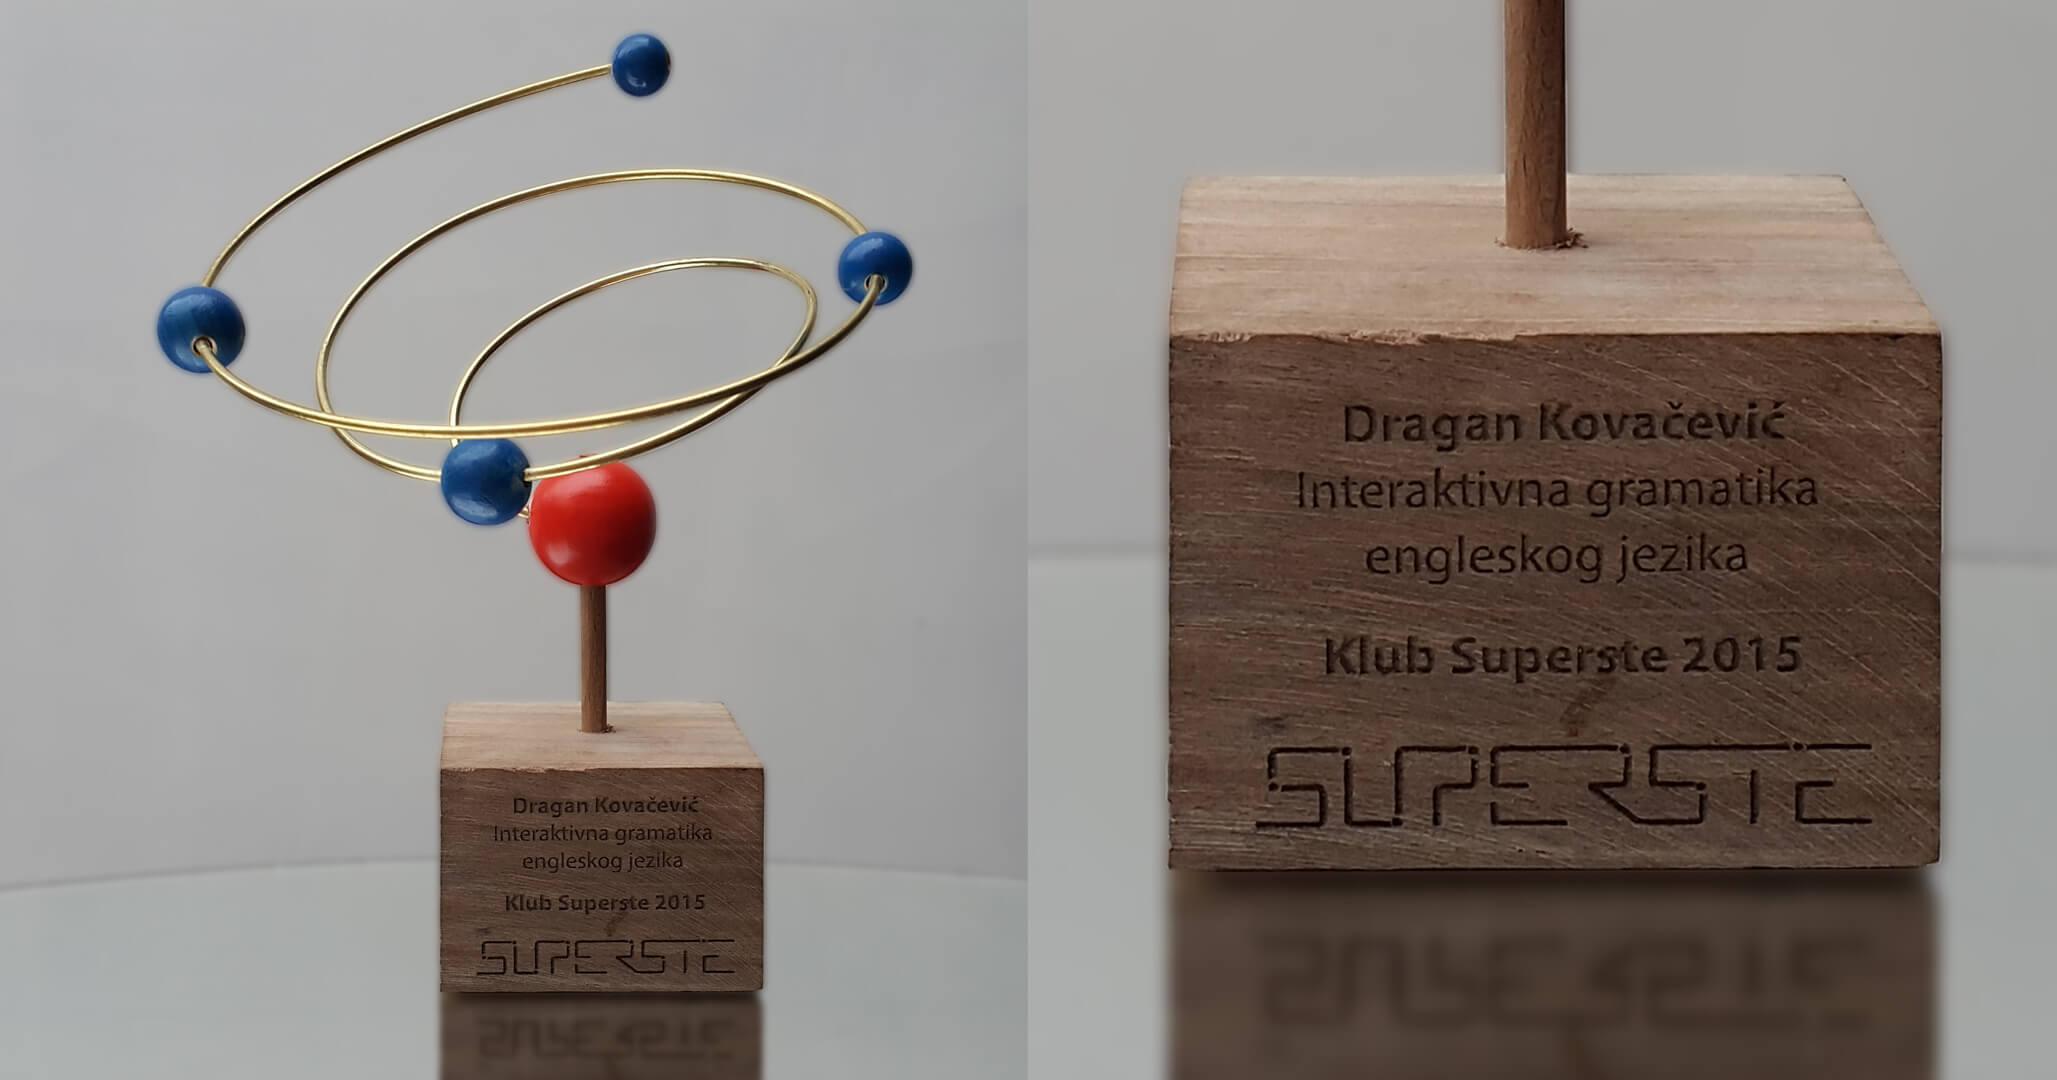 Interaktivna gramatika engleskog jezika – Klub Superste!